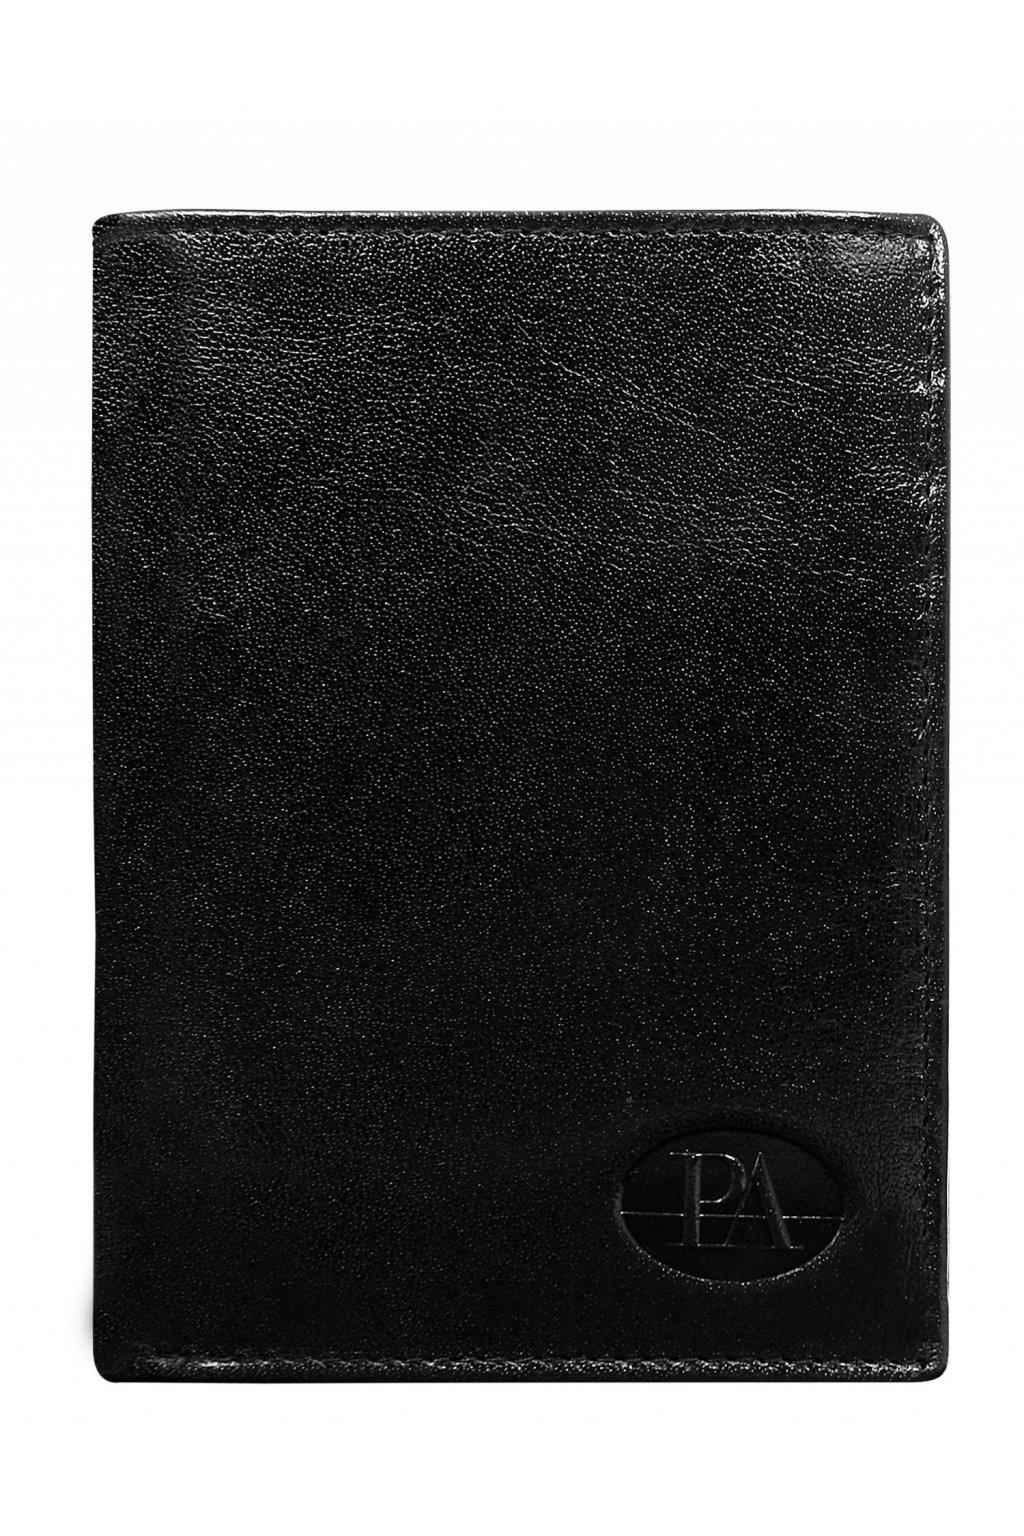 Pánska peňaženka kód CE-PR-PW-004-BTU.30